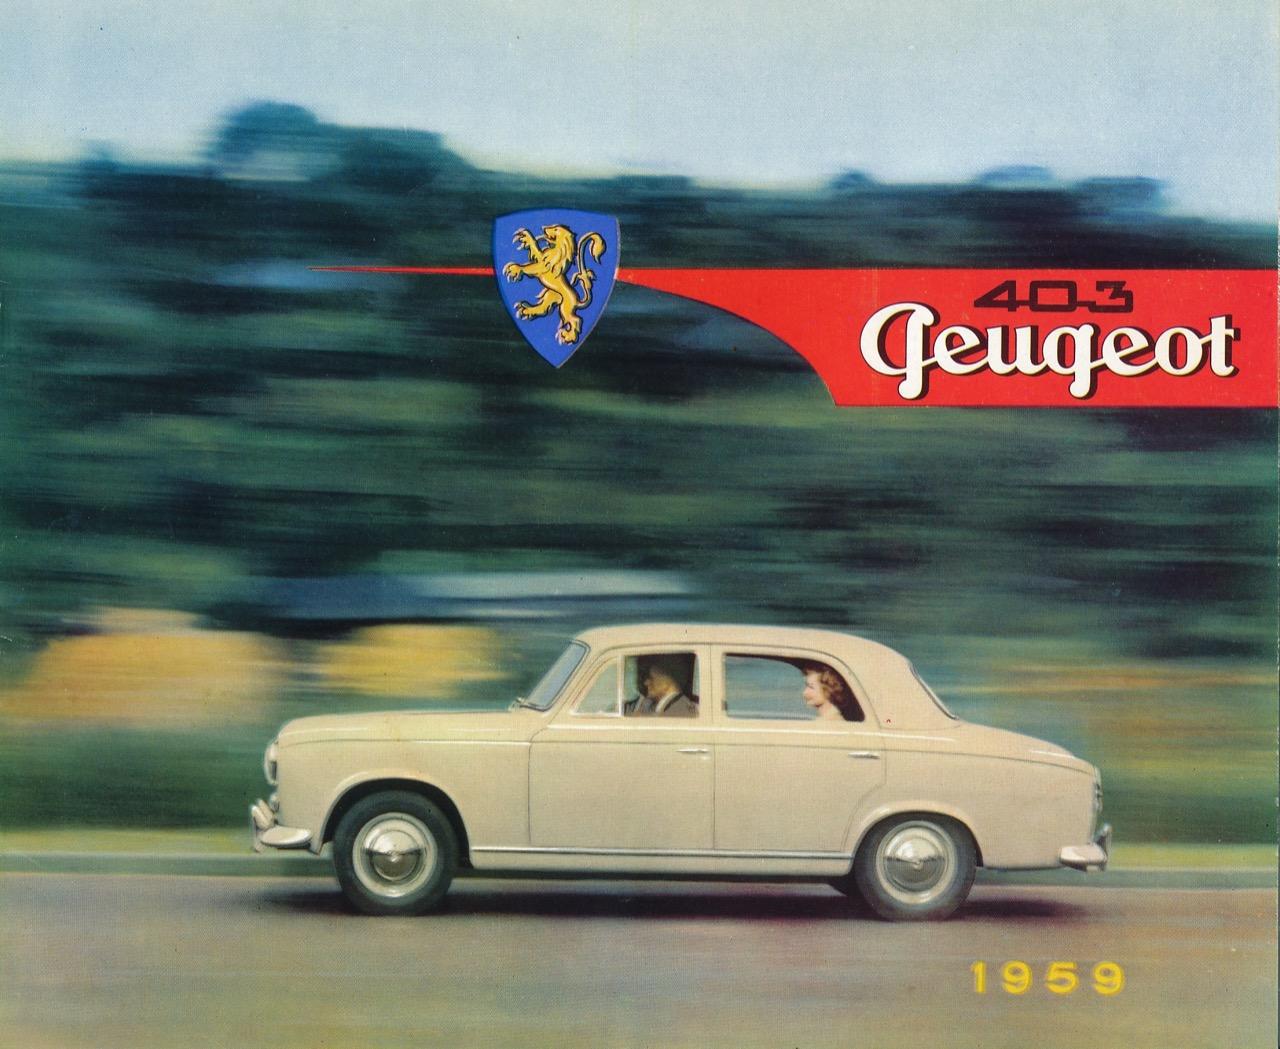 Peugeot 403 Jaeger - foto